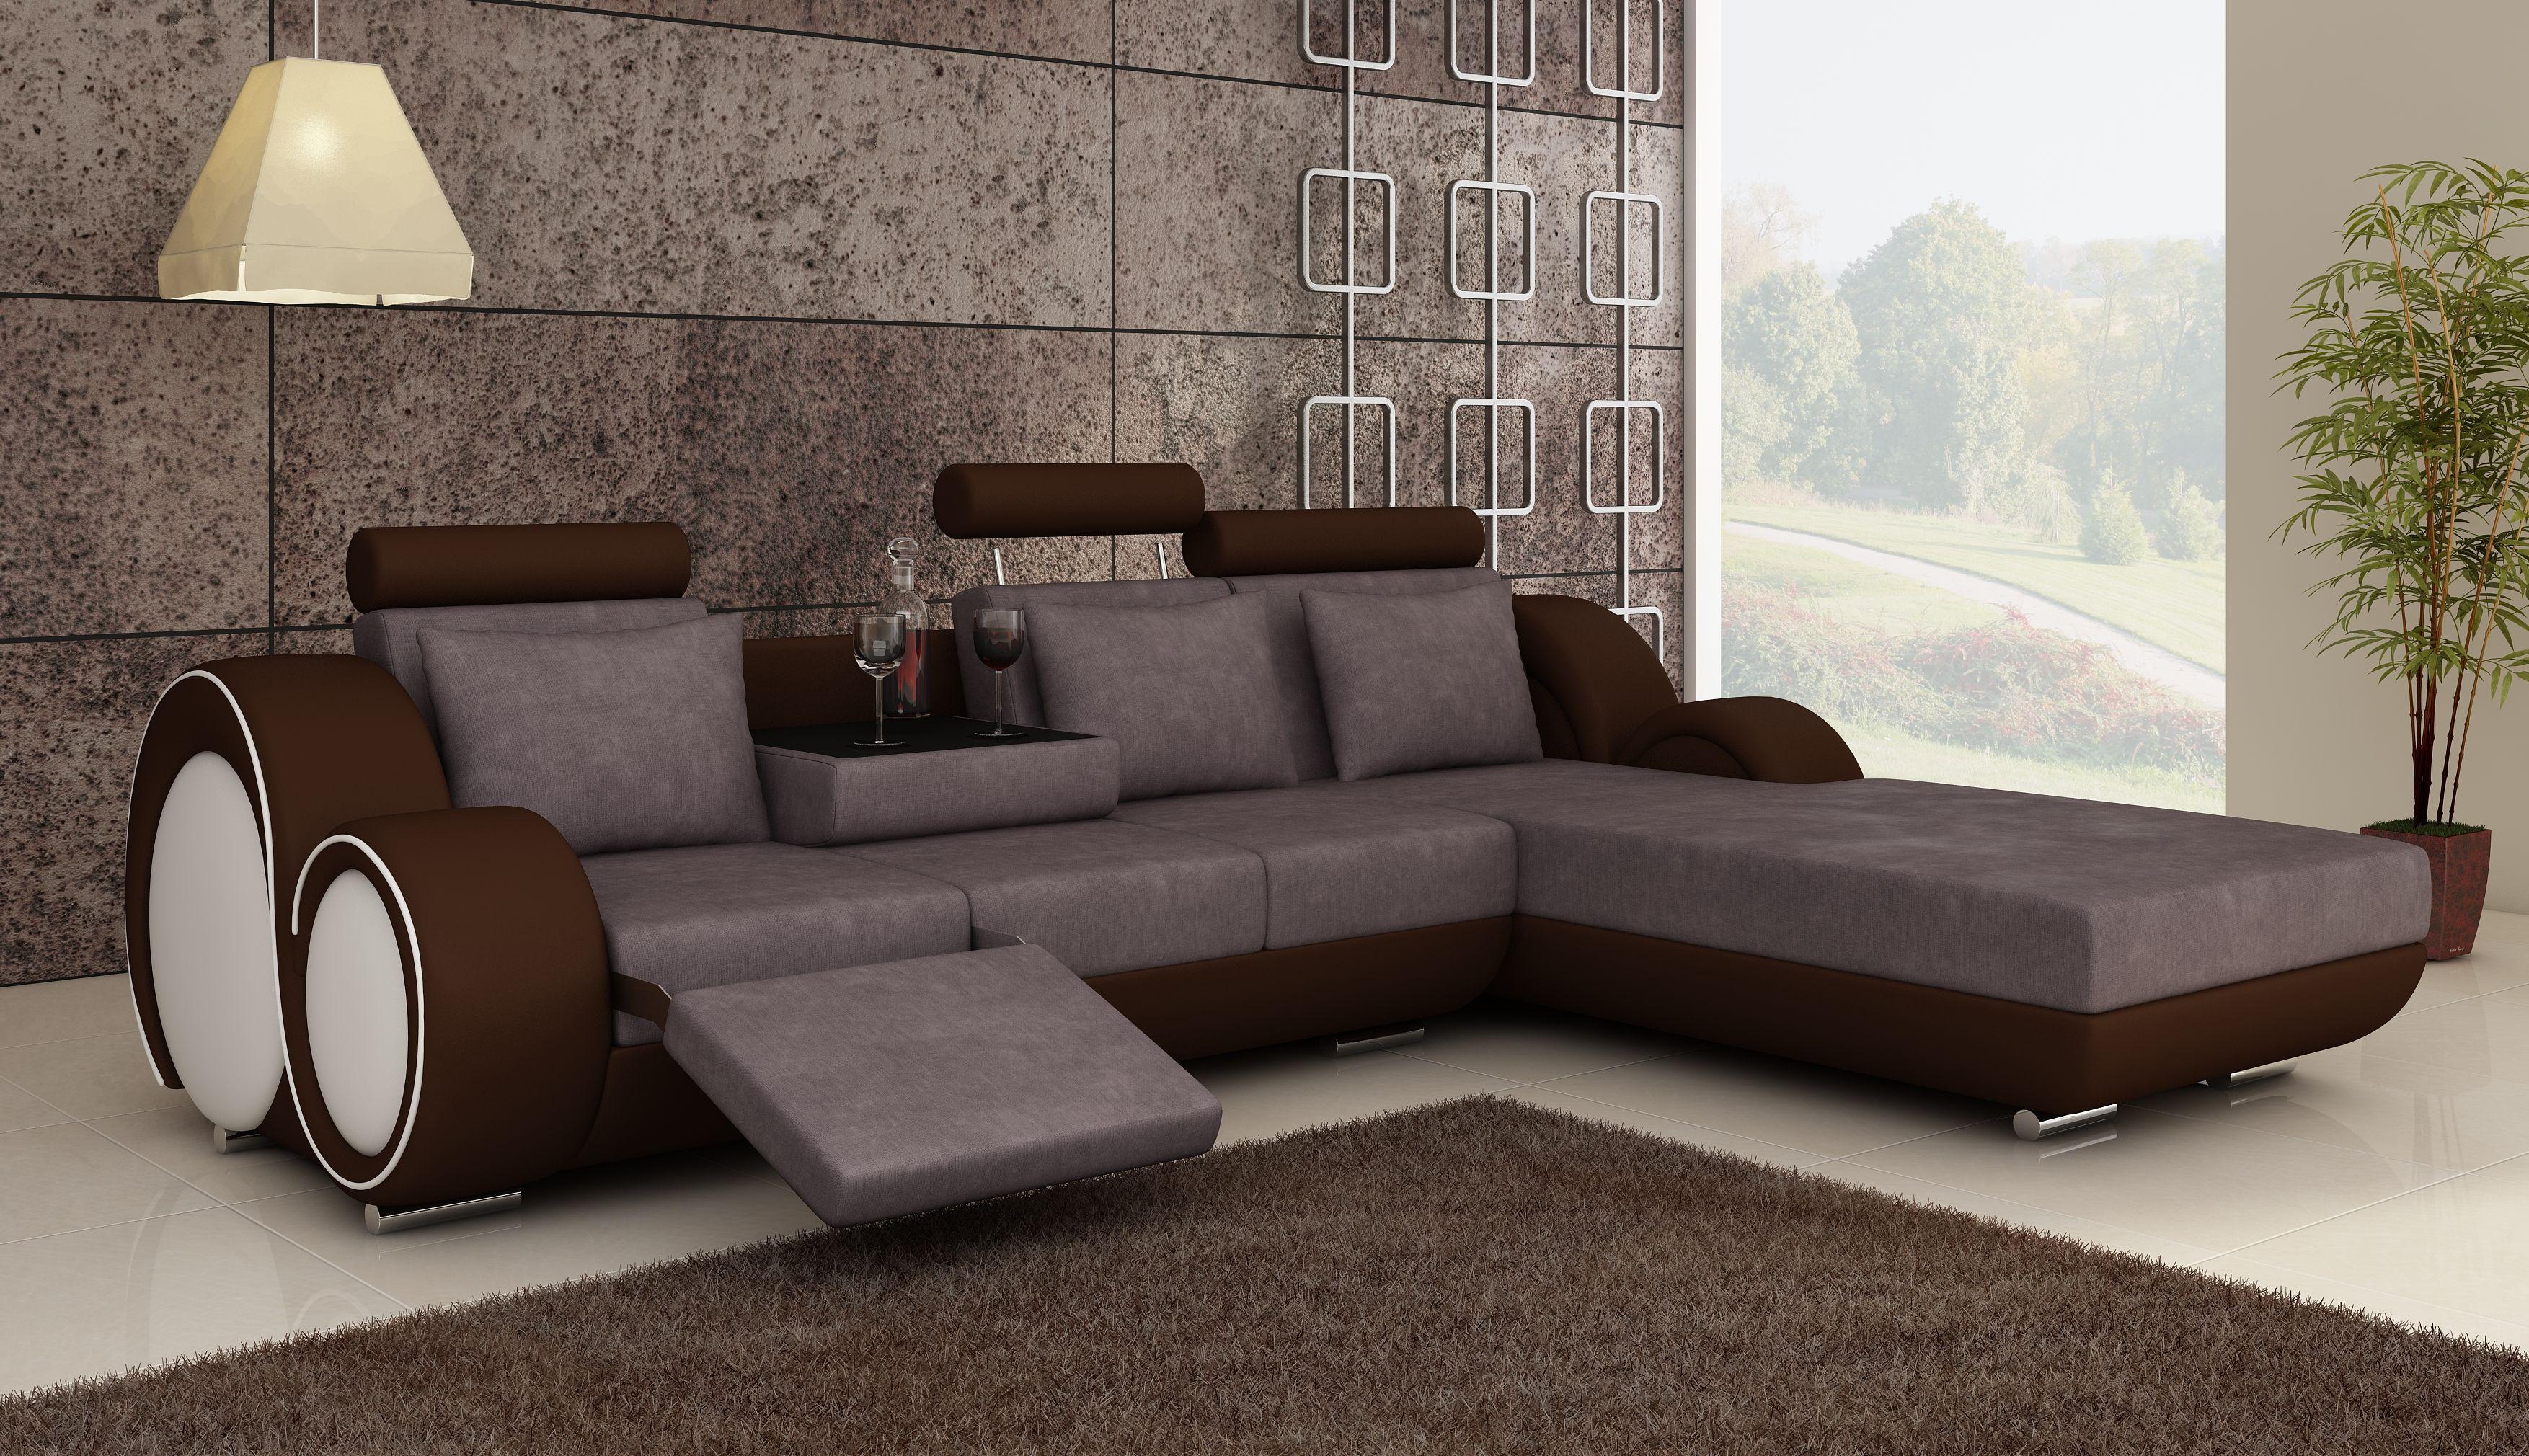 Designer Couch In 2020 Corner Sofa Design Couch Design